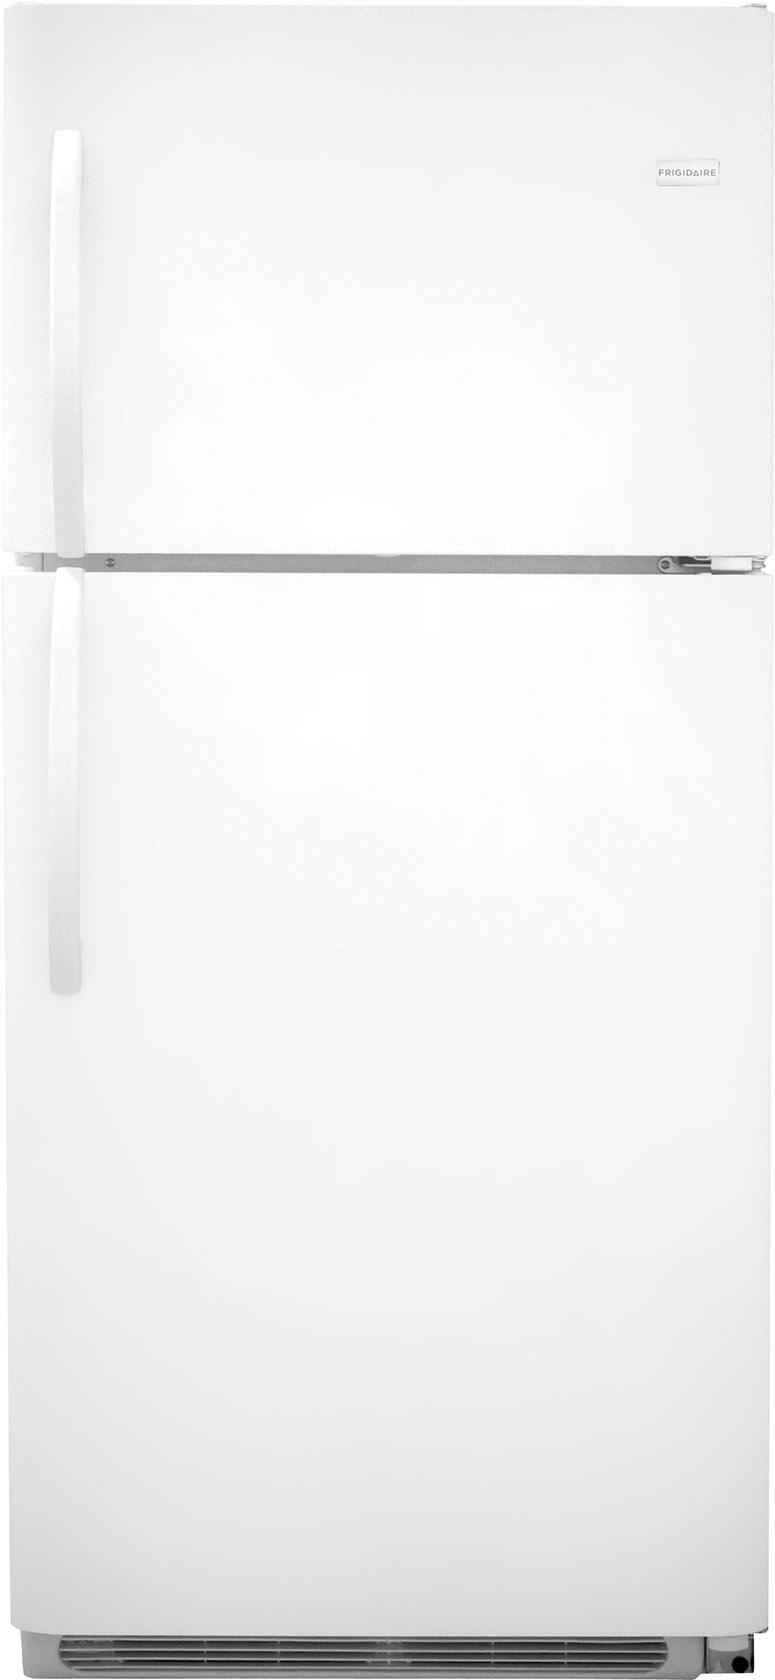 Frigidaire Refrigerator Model FFTR2126LW3 Parts